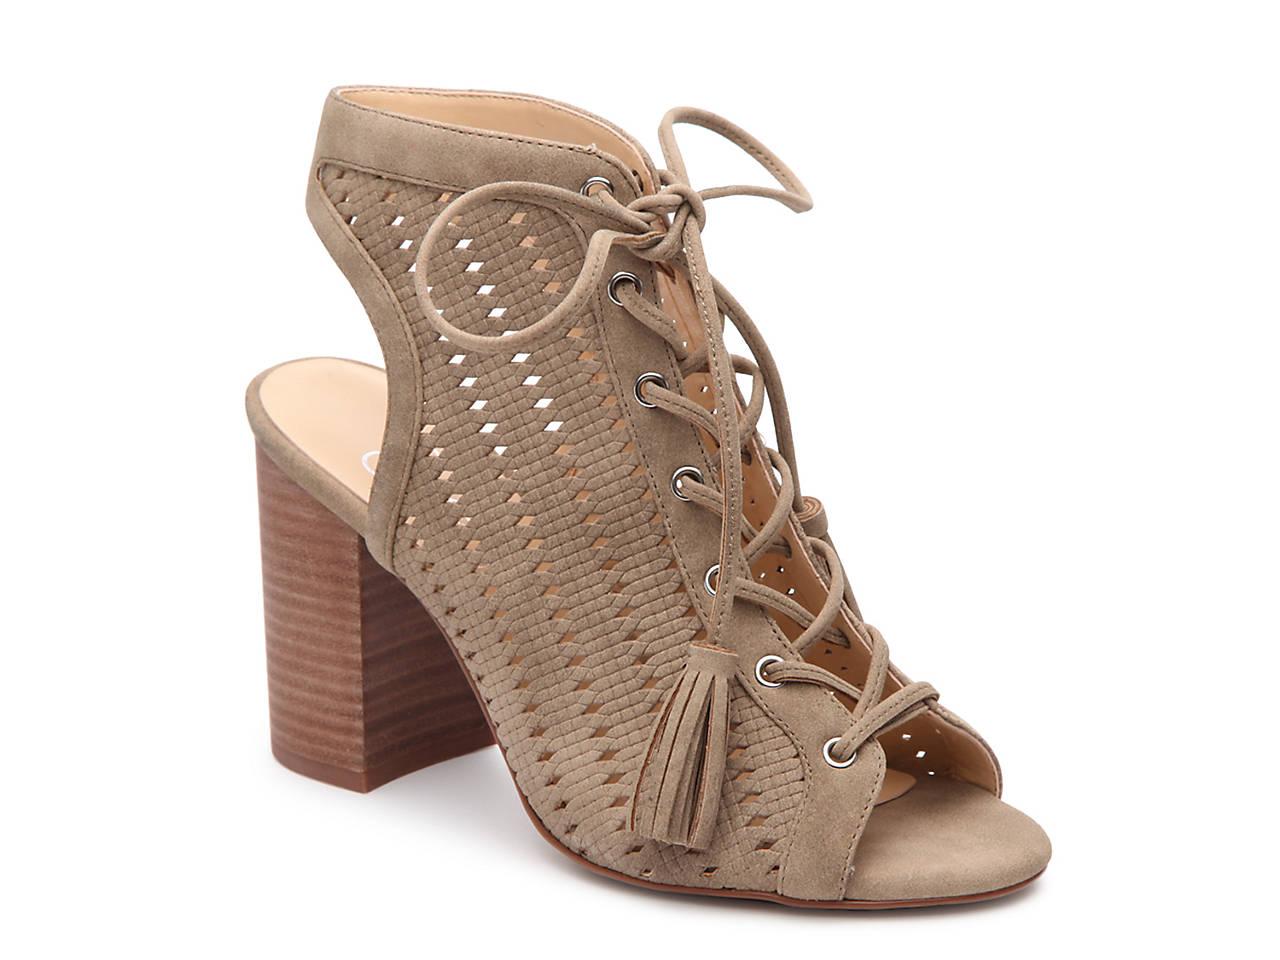 38b3094905 Jessica Simpson Shoes Dsw - Style Guru  Fashion